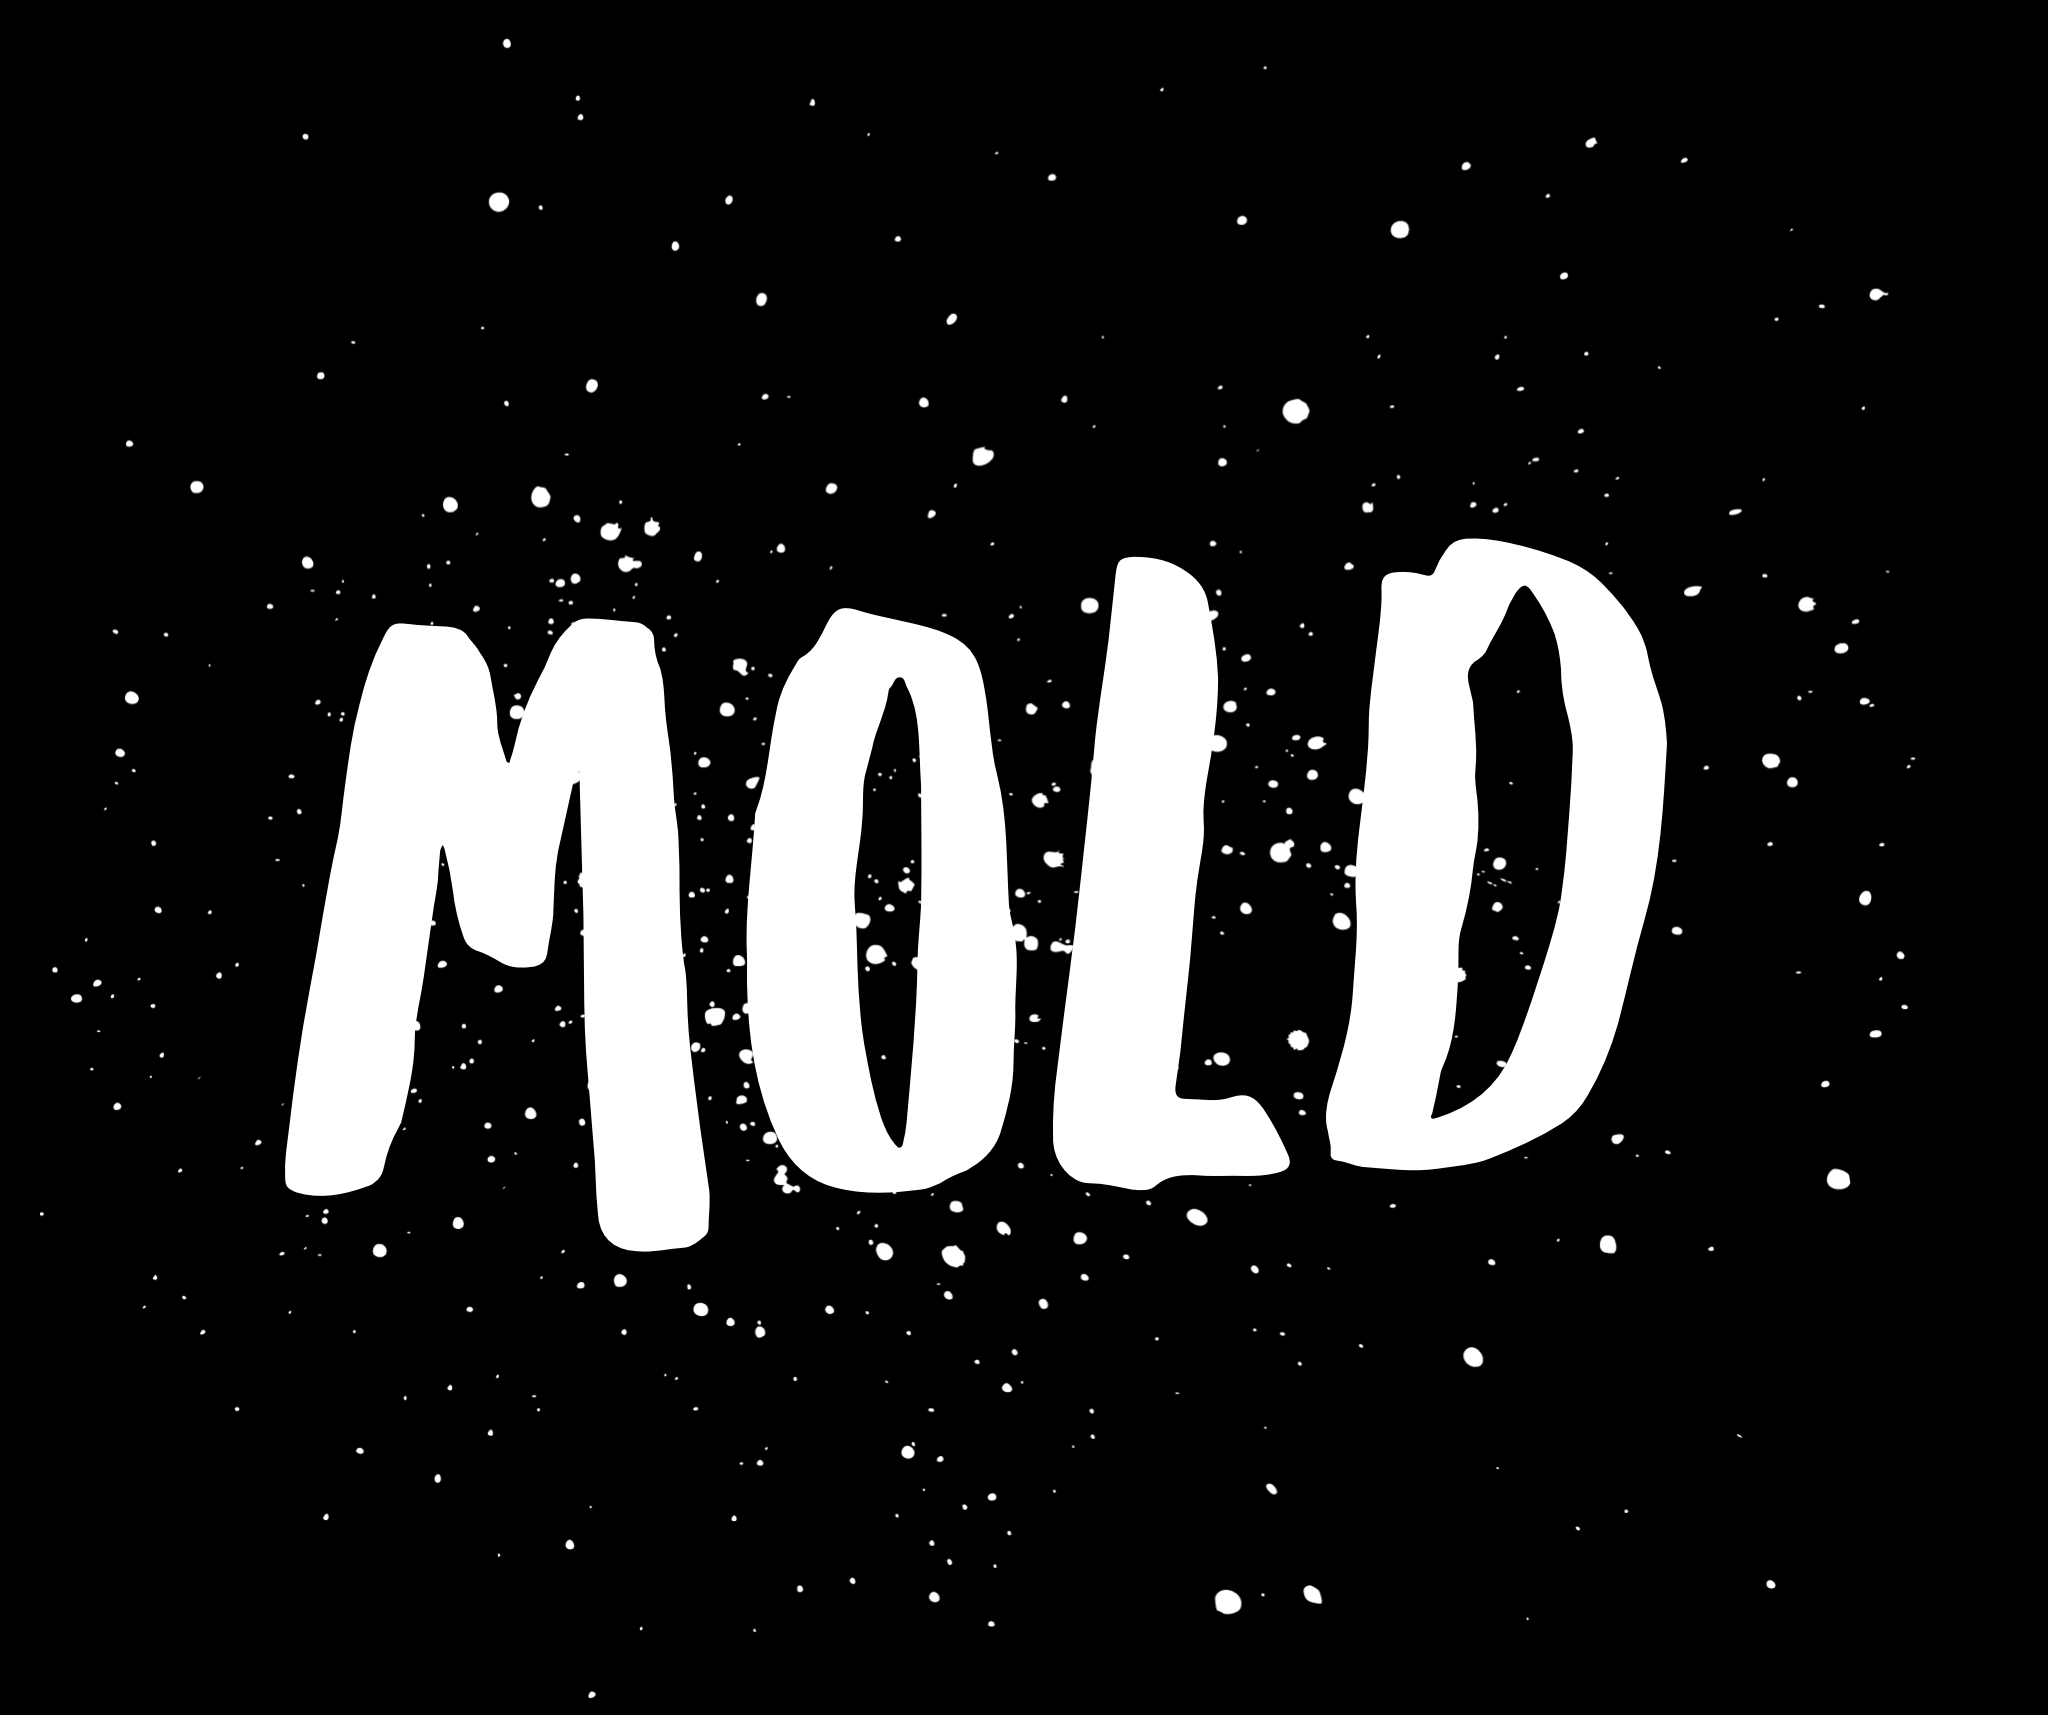 Mold is bad